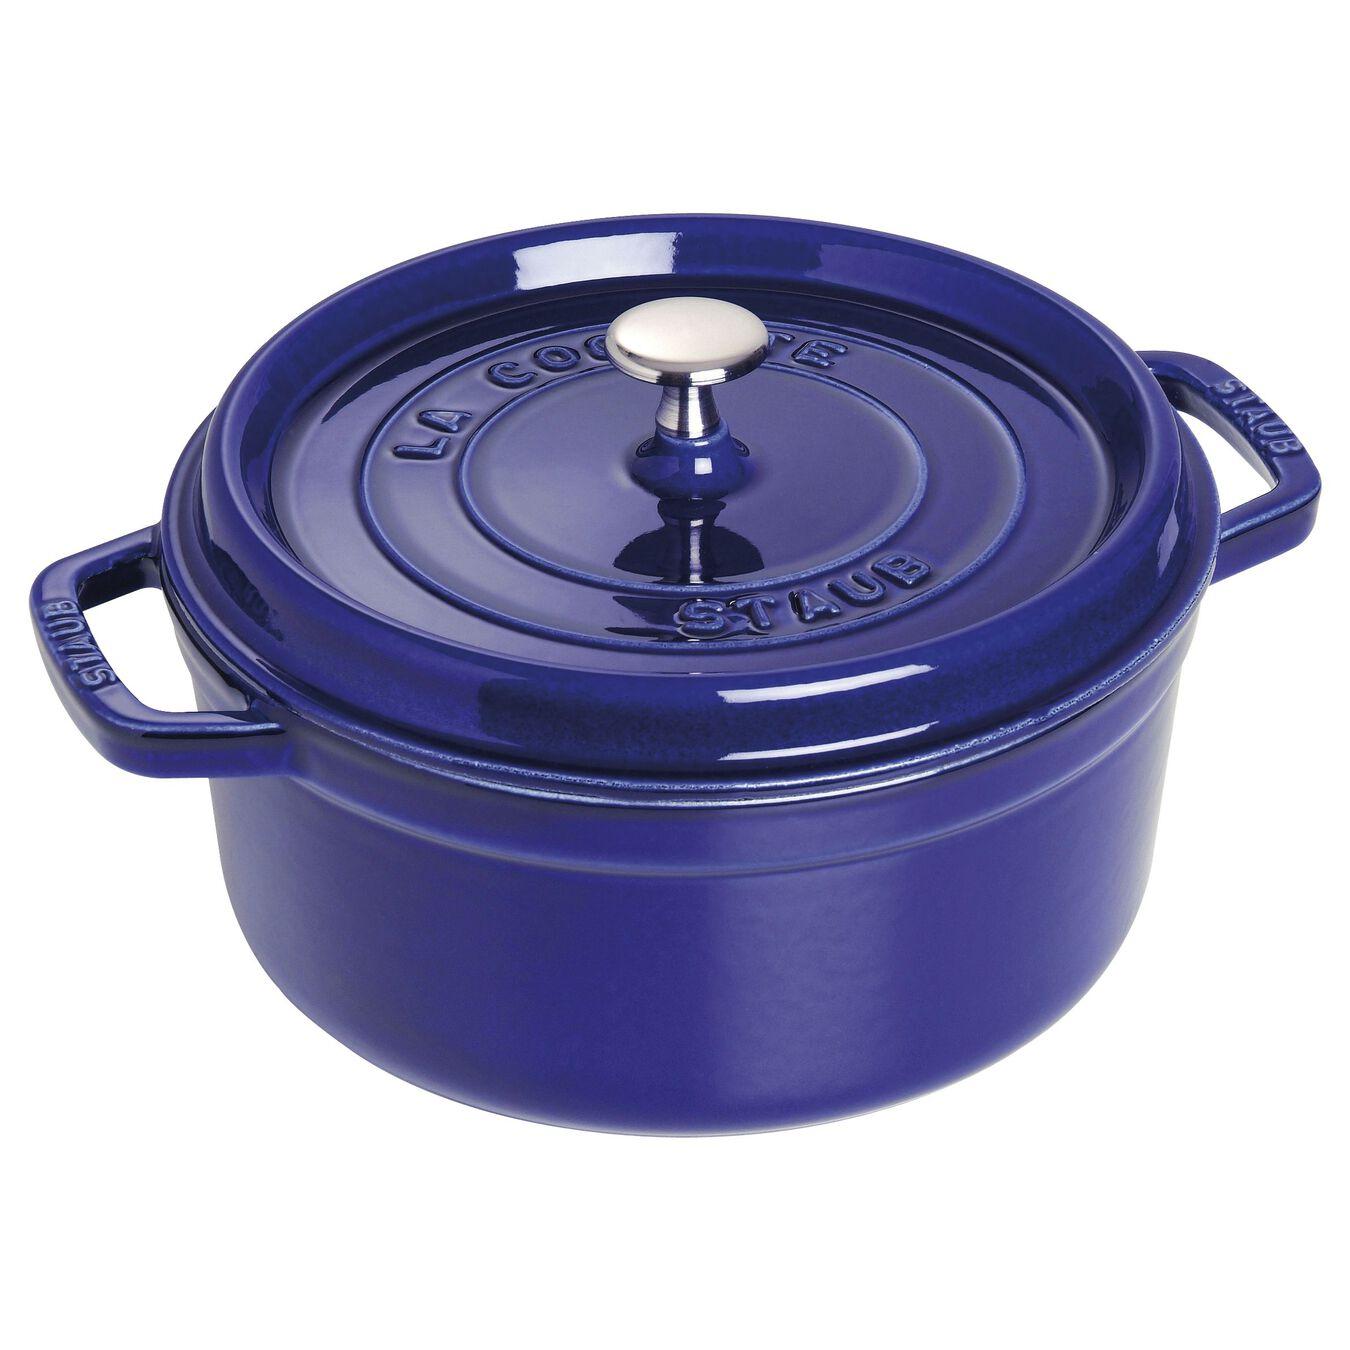 Staub 4-Quart Cocotte Dark Blue